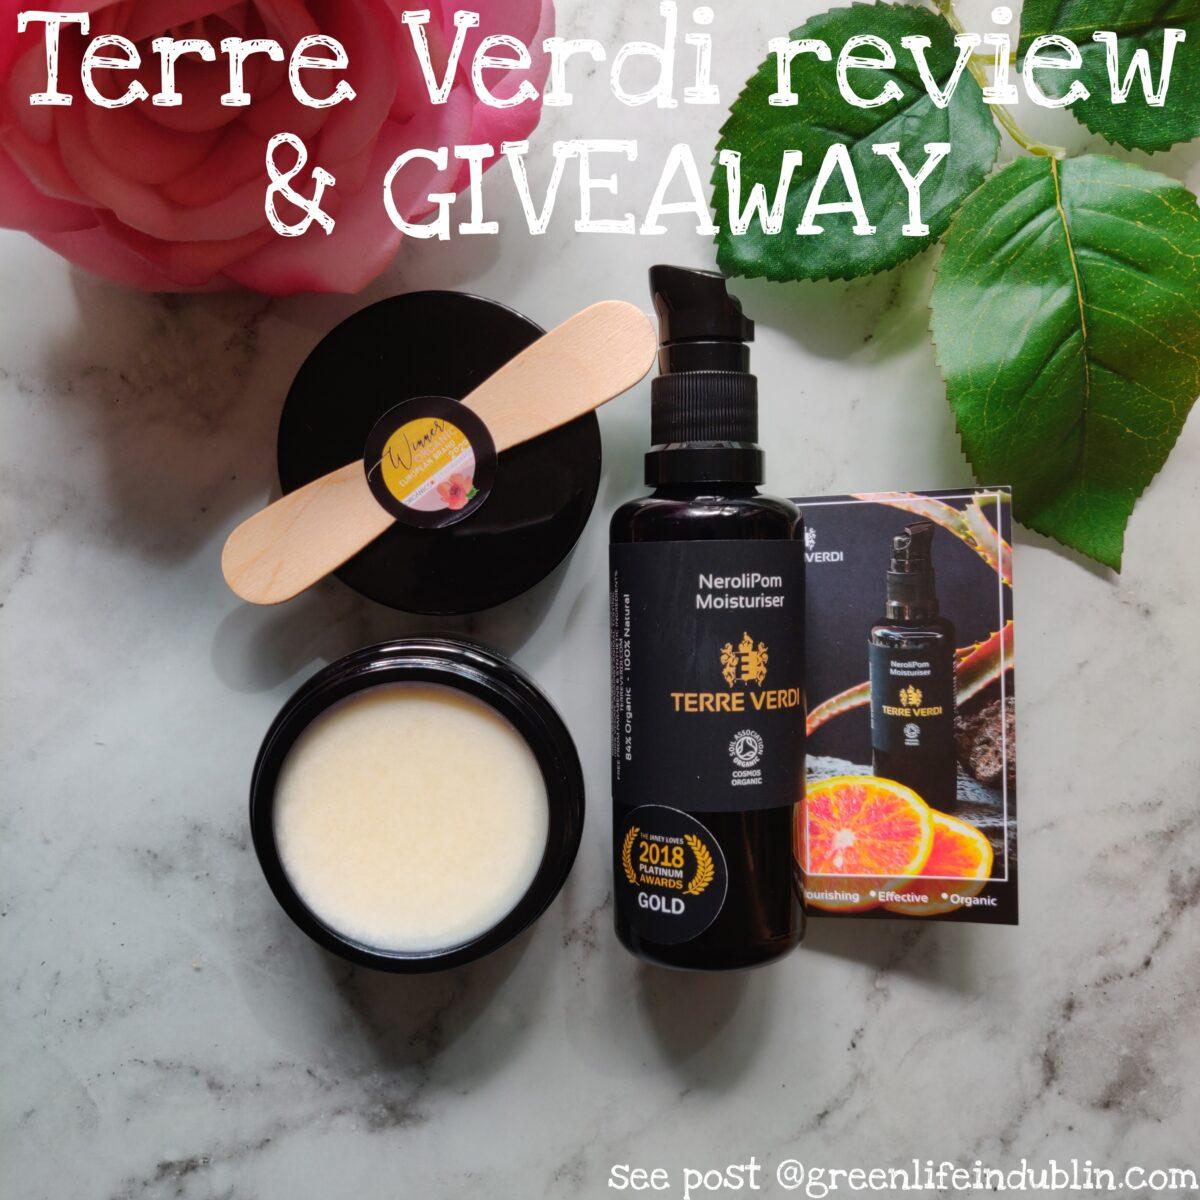 Terre Verdi review & giveaway